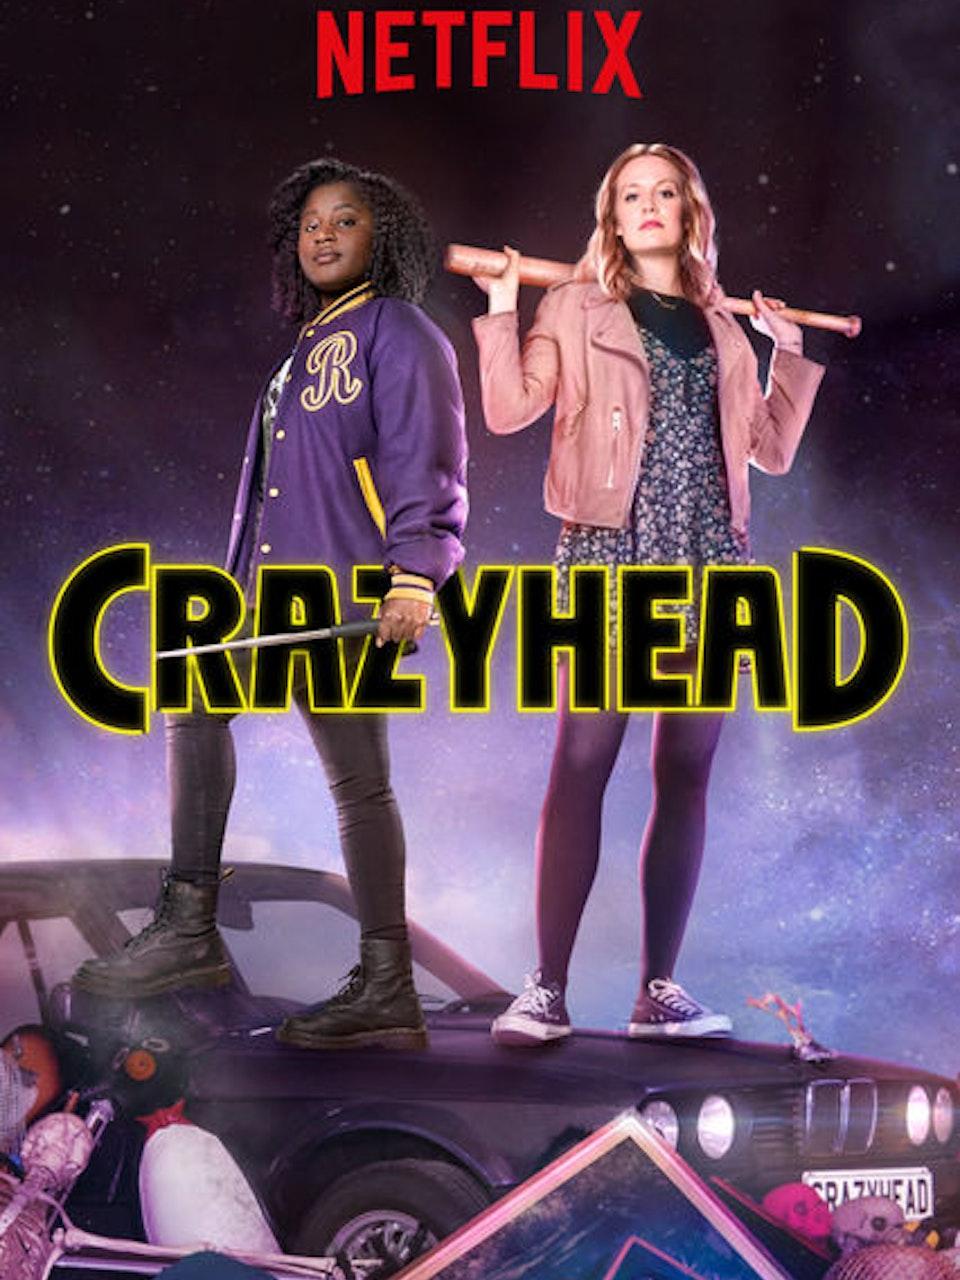 Crazyhead (Netflix USA / Channel 4)